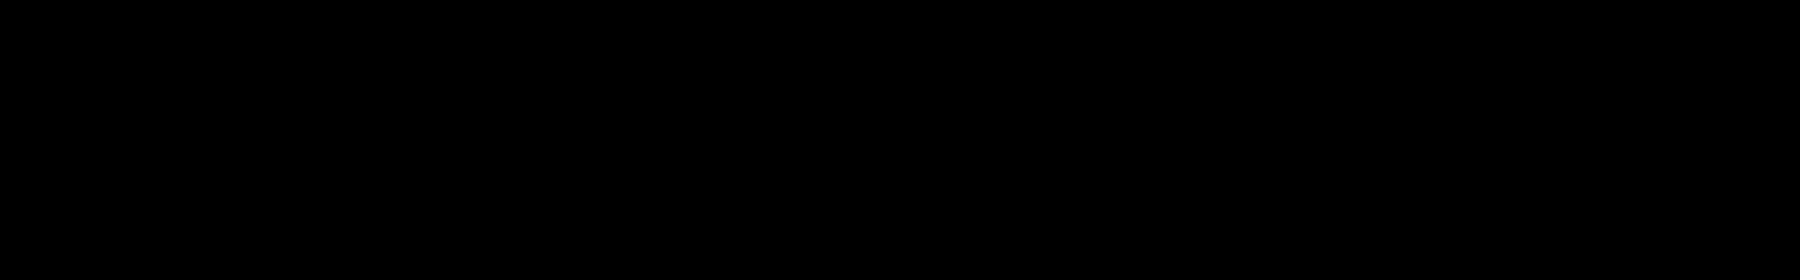 Athenaeum - Melodic Chords & Arps for Cthulhu audio waveform